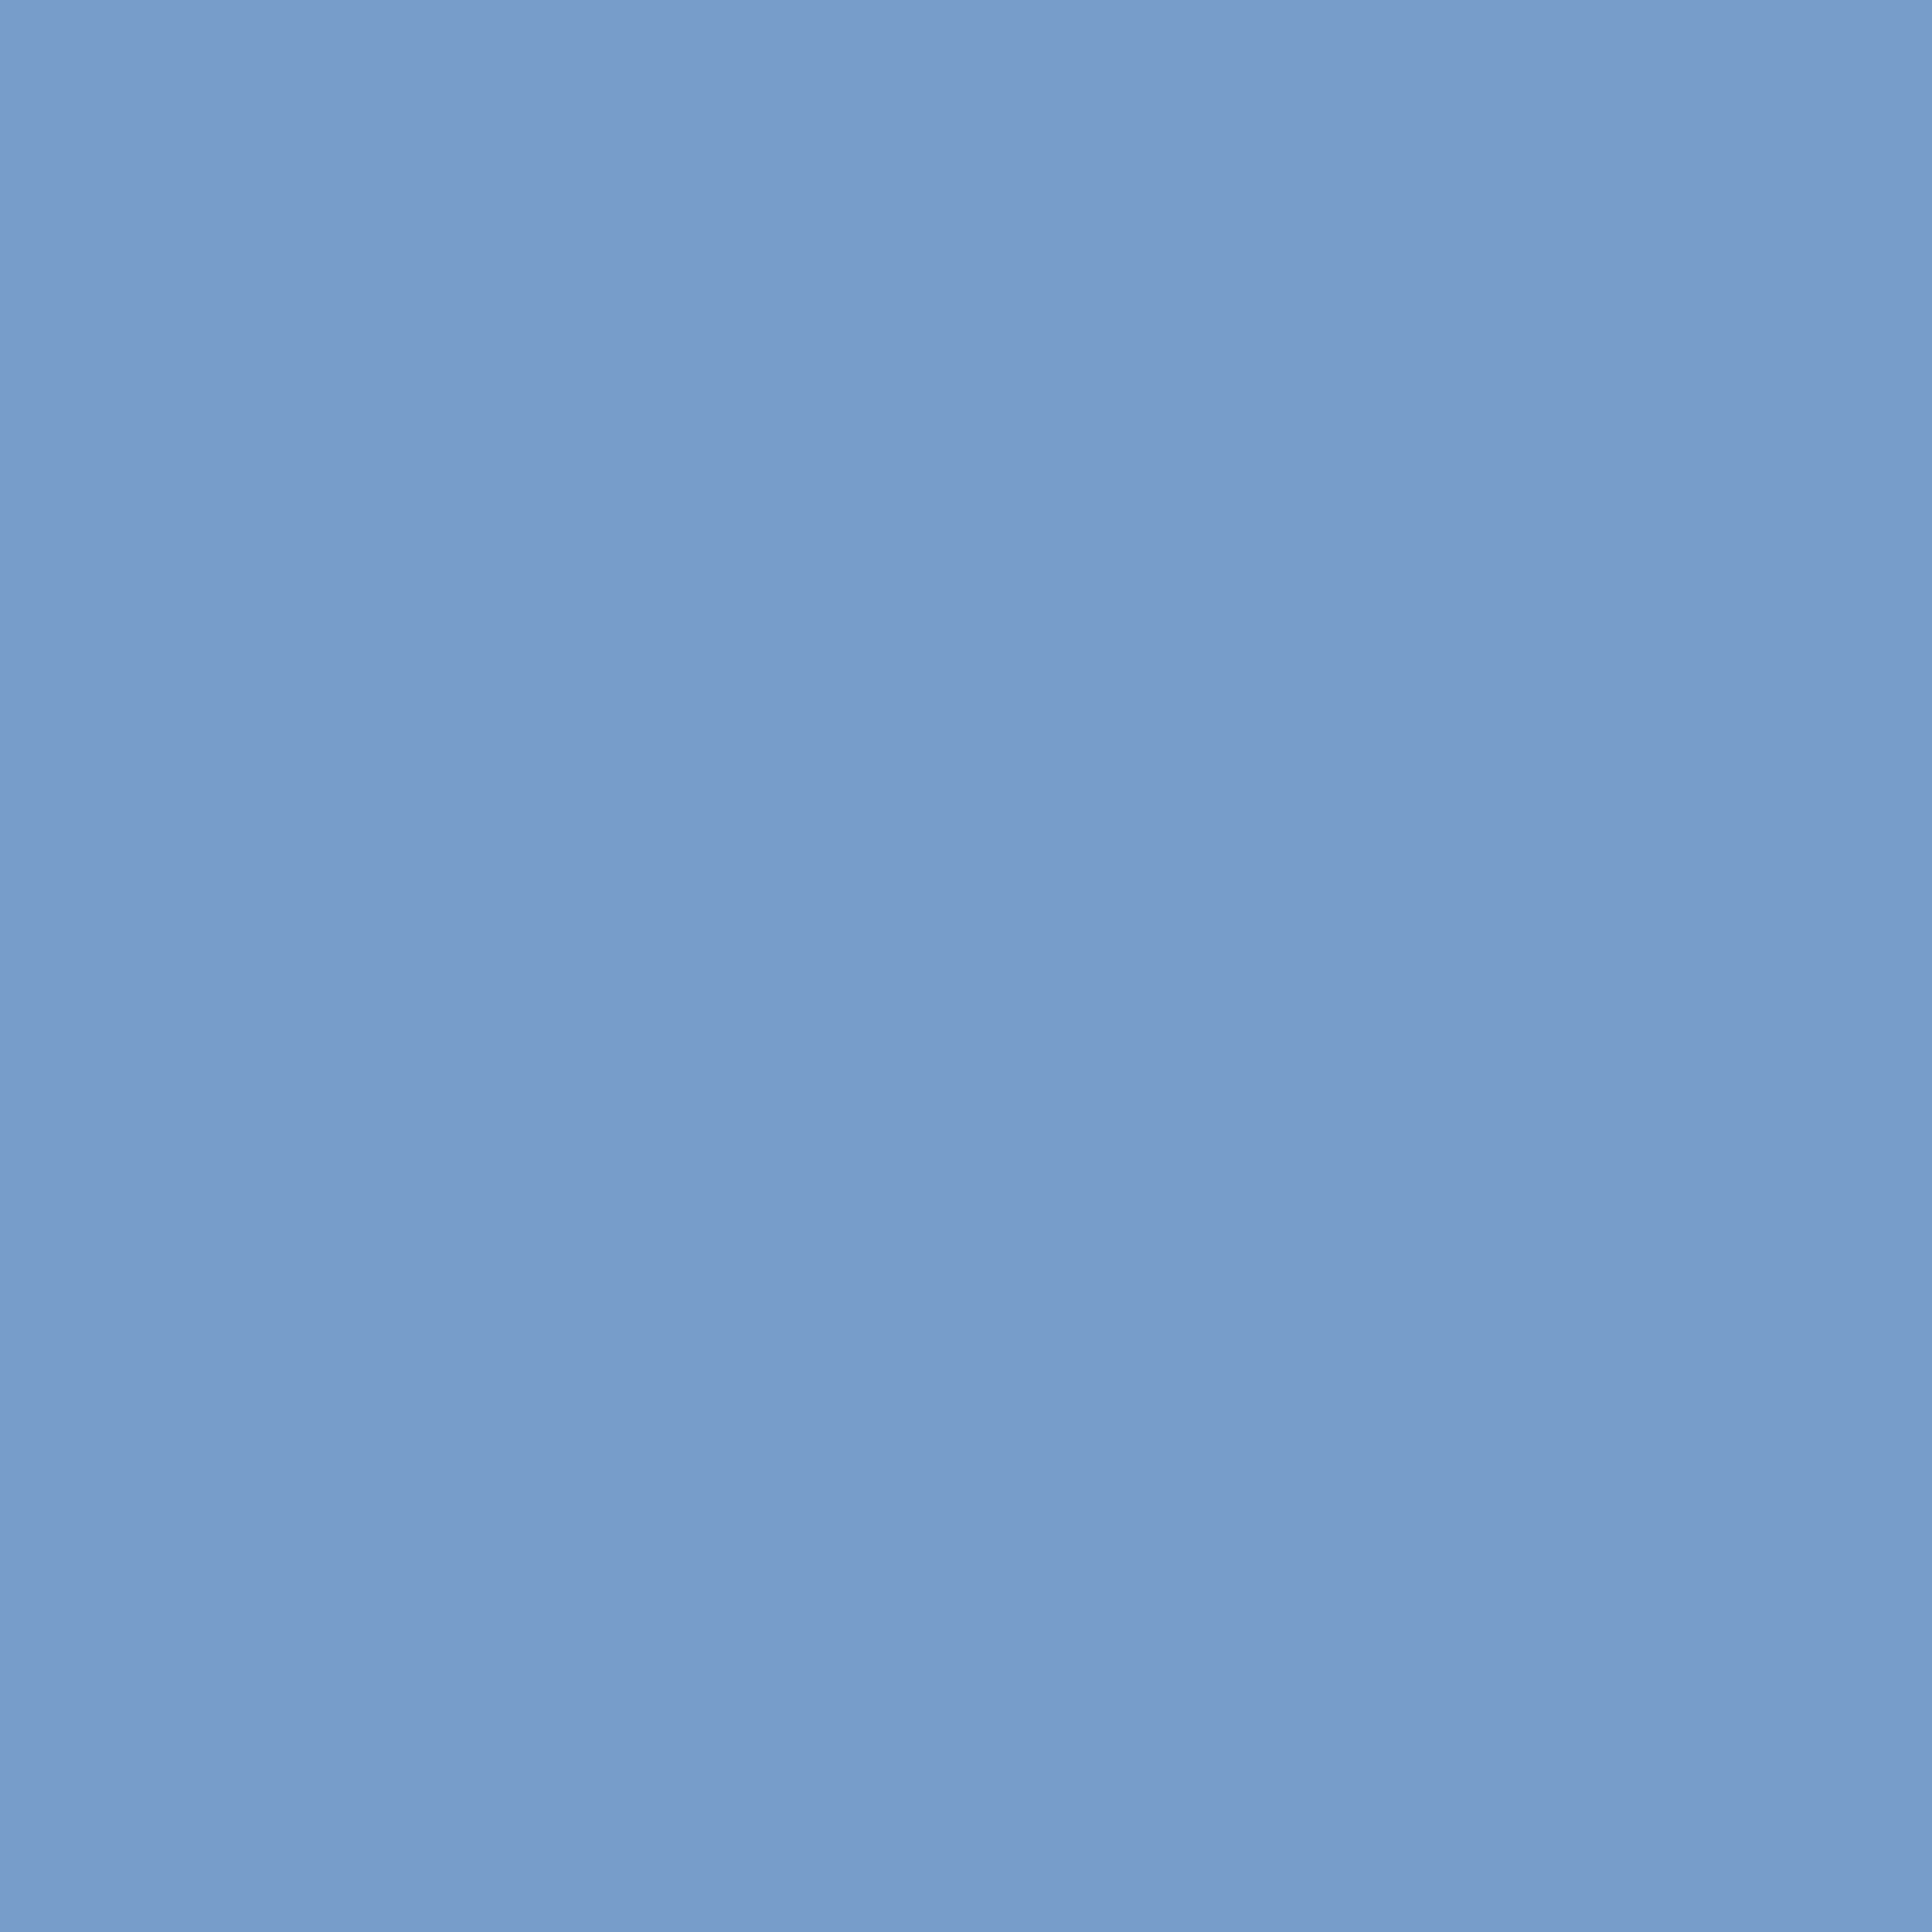 Blue Background Pastel - GOOGLESACK